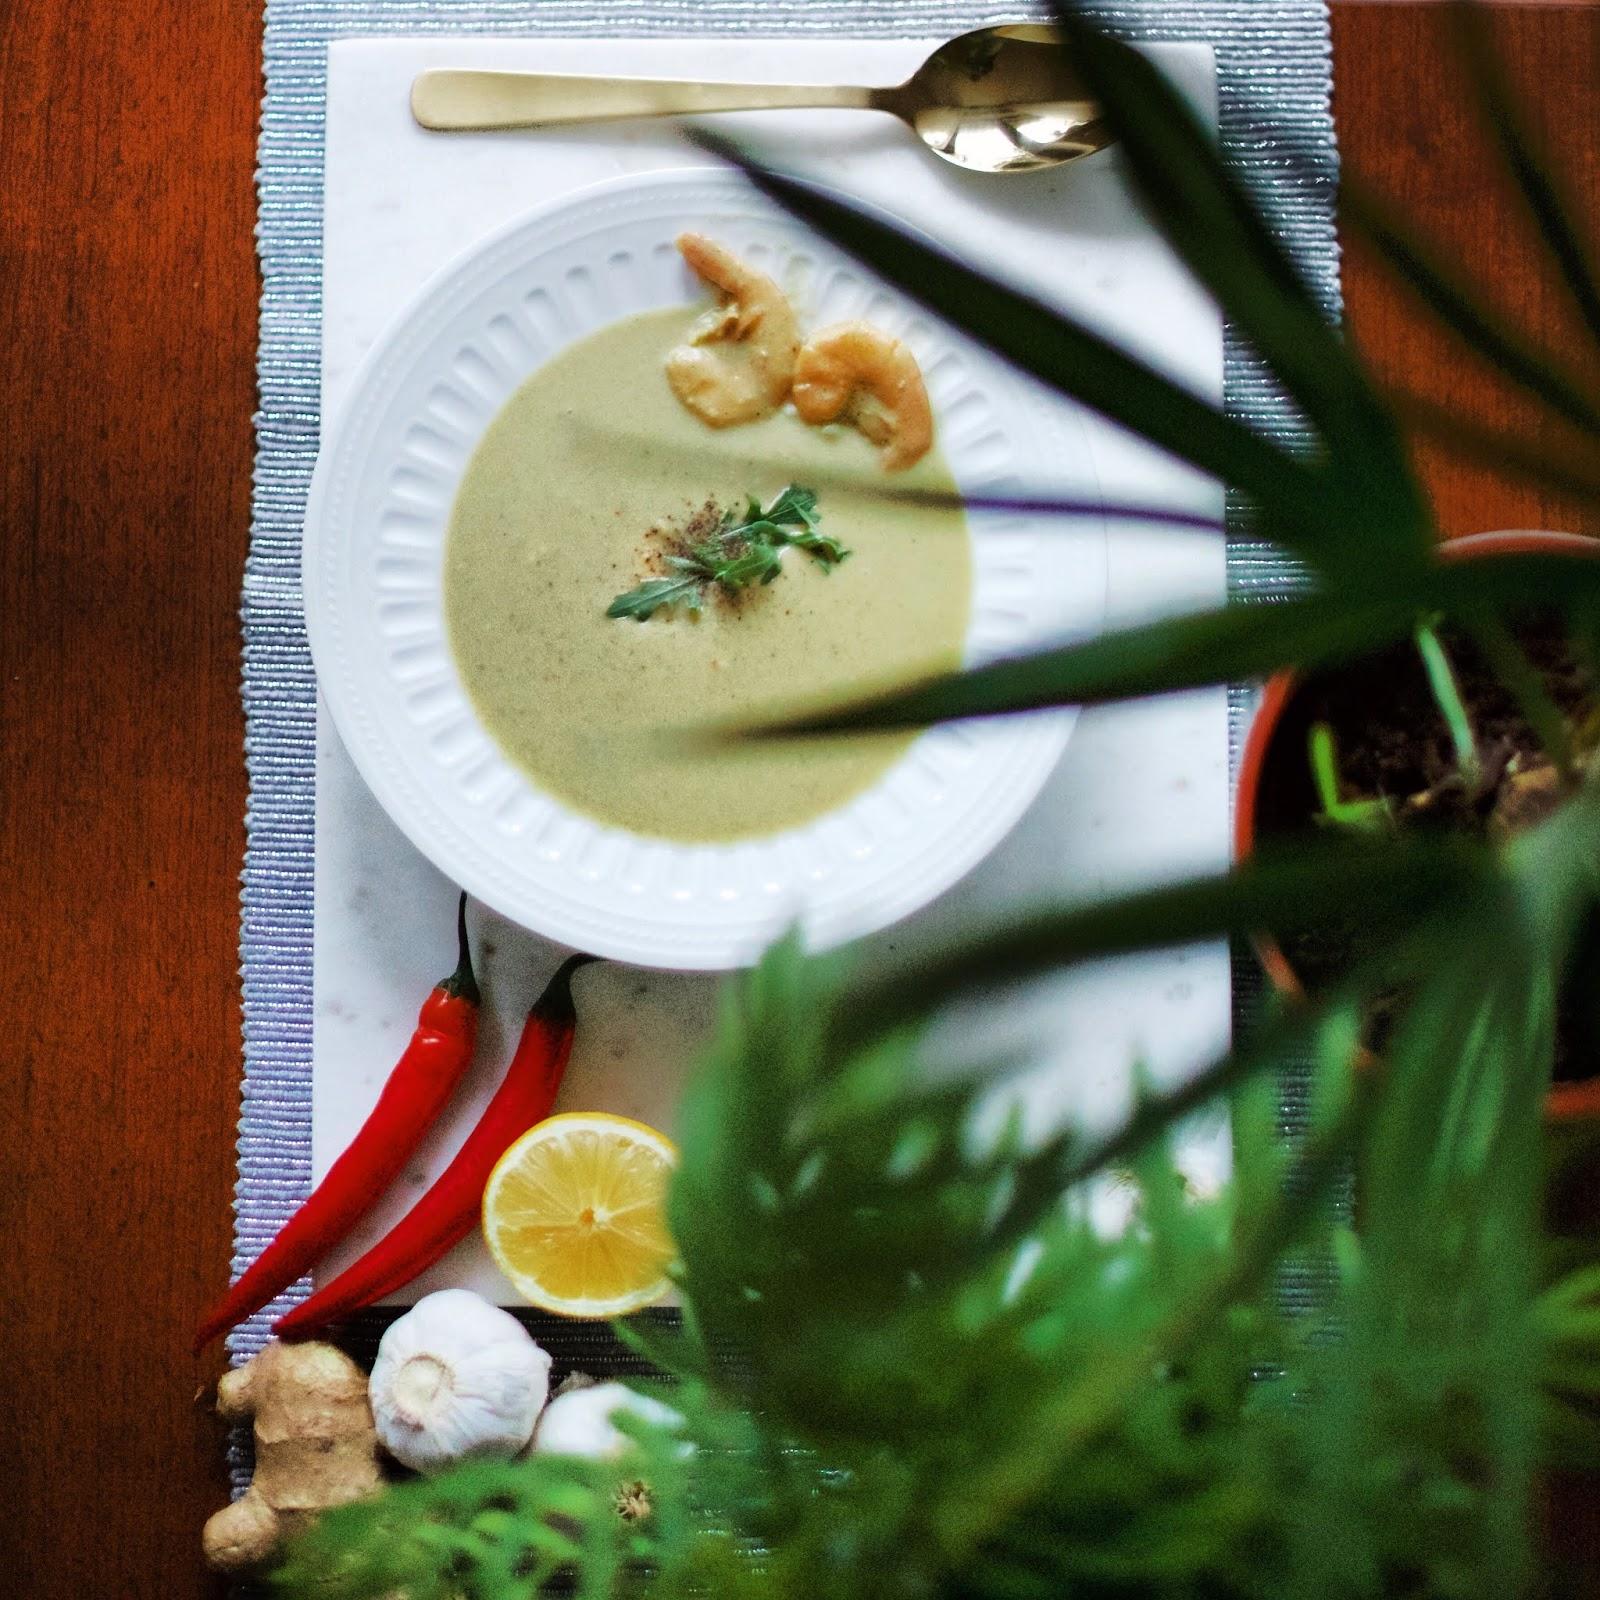 Tajska, gęsta zupa kokosowa z krewetkami.